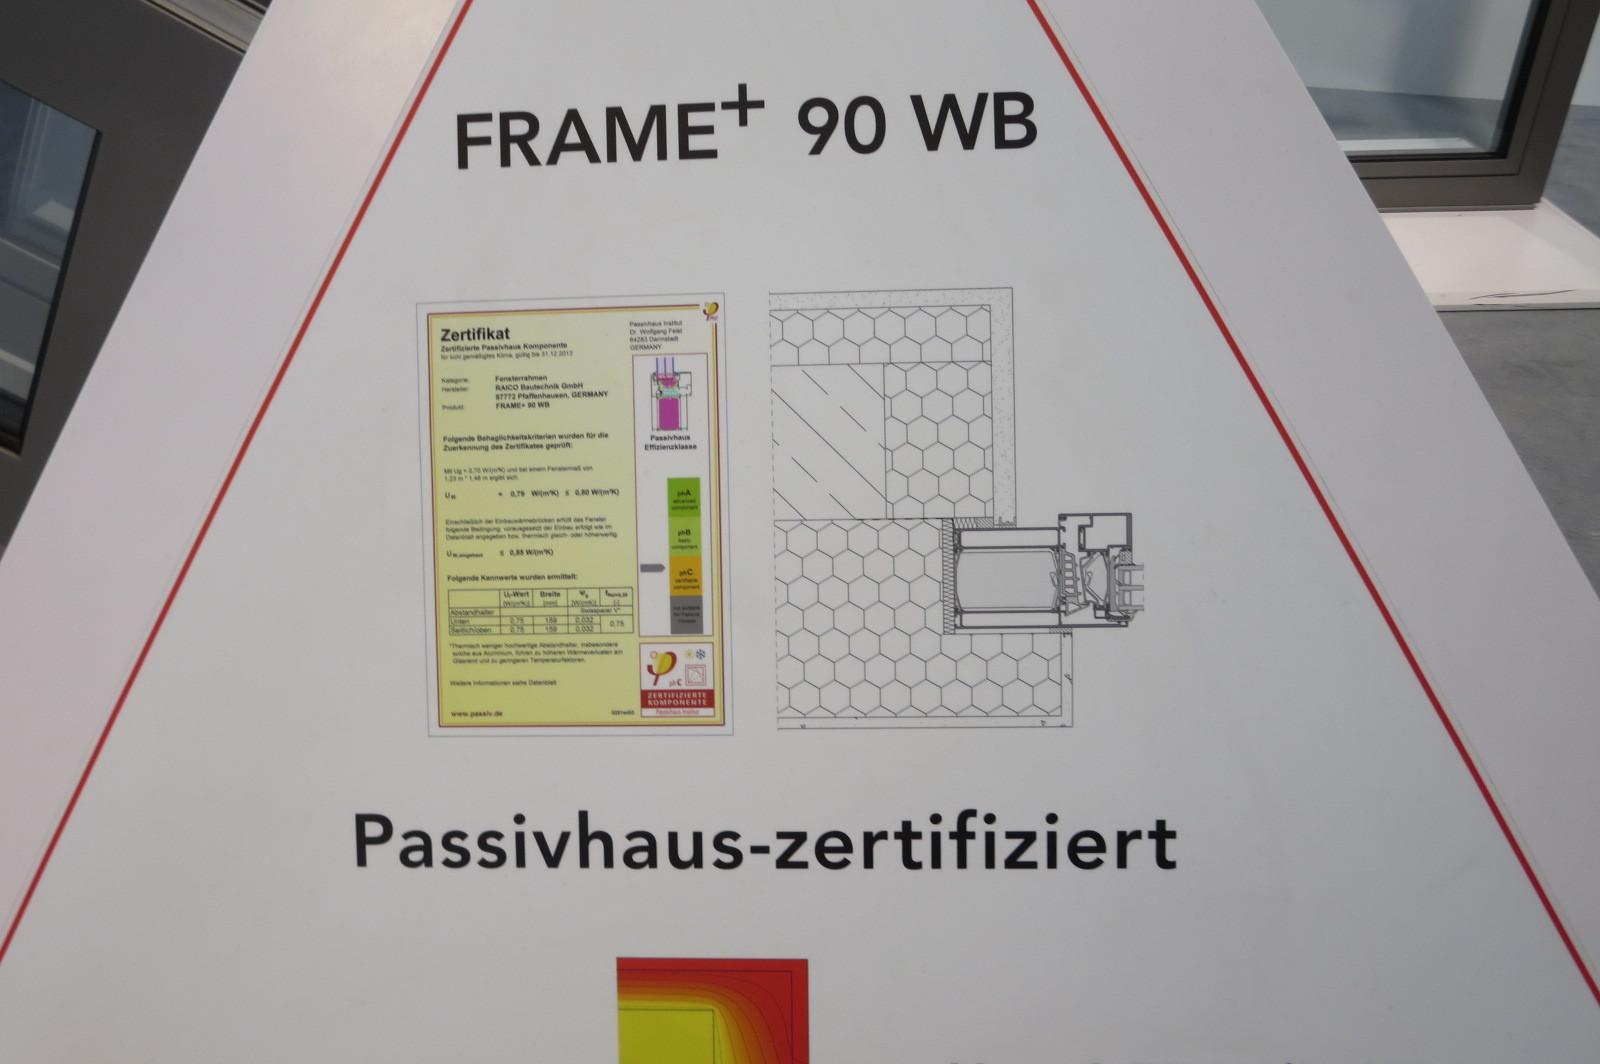 PウインドウJ秋田地窓WA:Frame+とは_e0054299_10421443.jpg